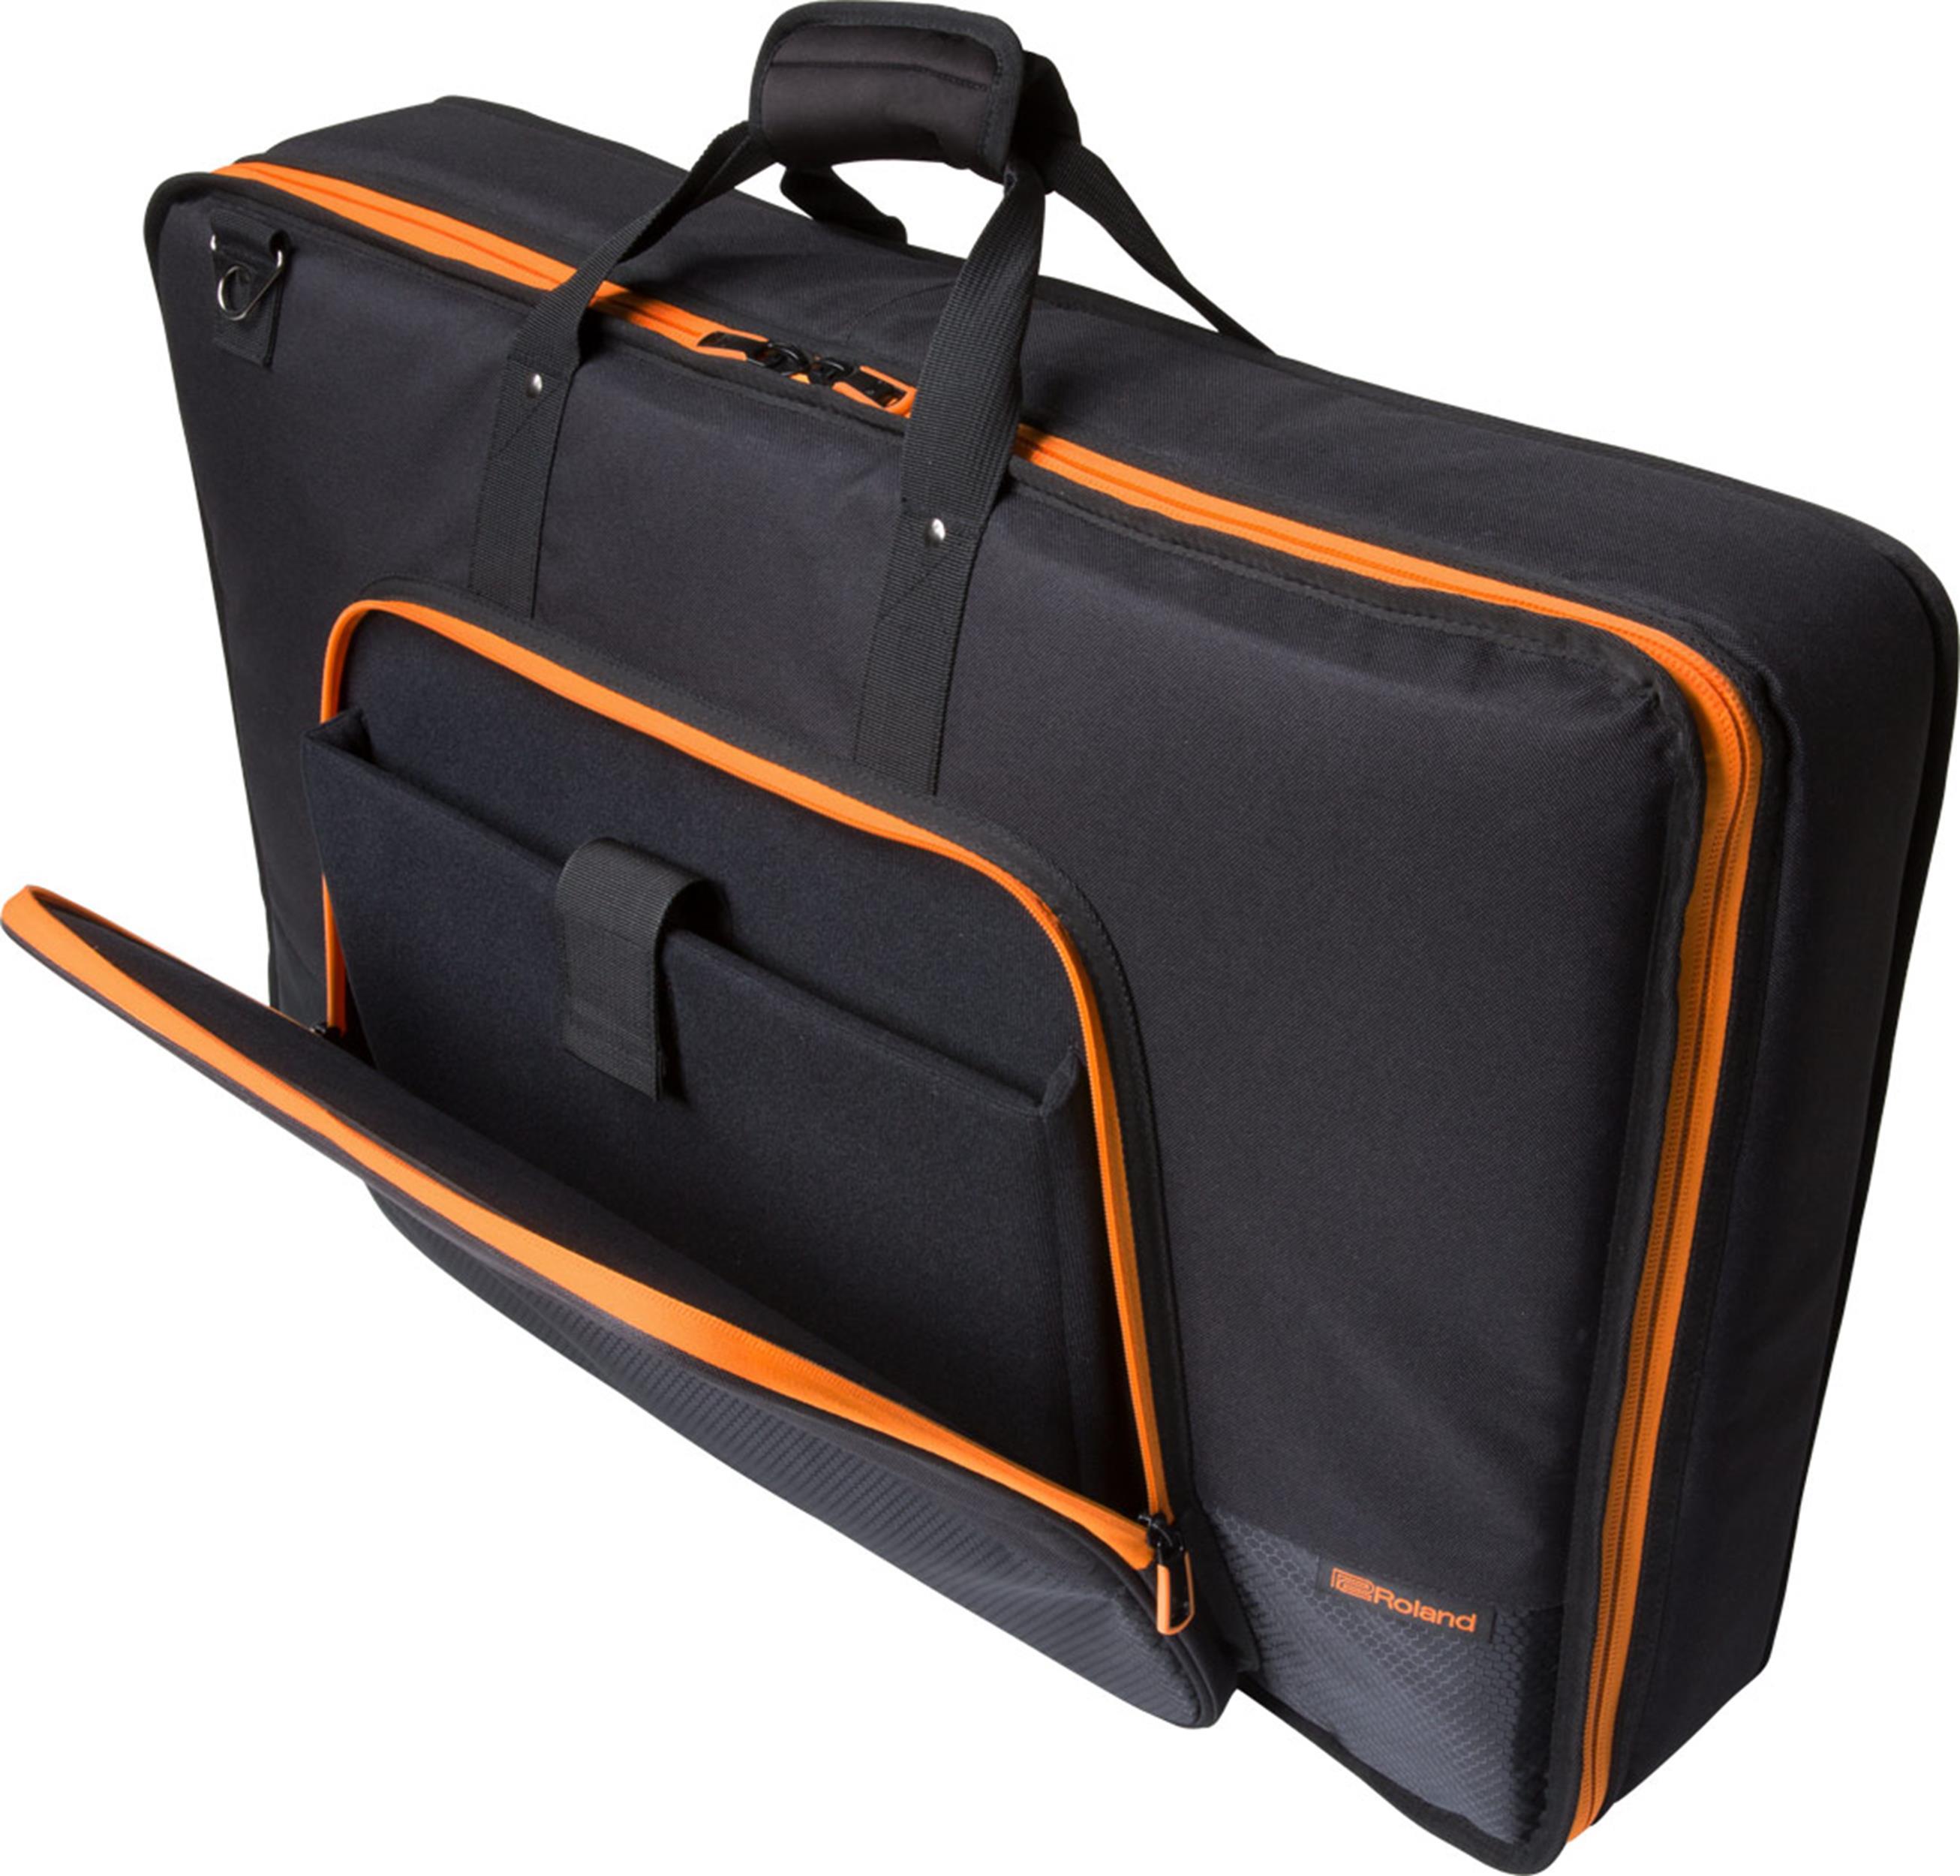 ROLAND CB-GDJ808  - Dj Equipment Accessori - Borse e Custodie DJ